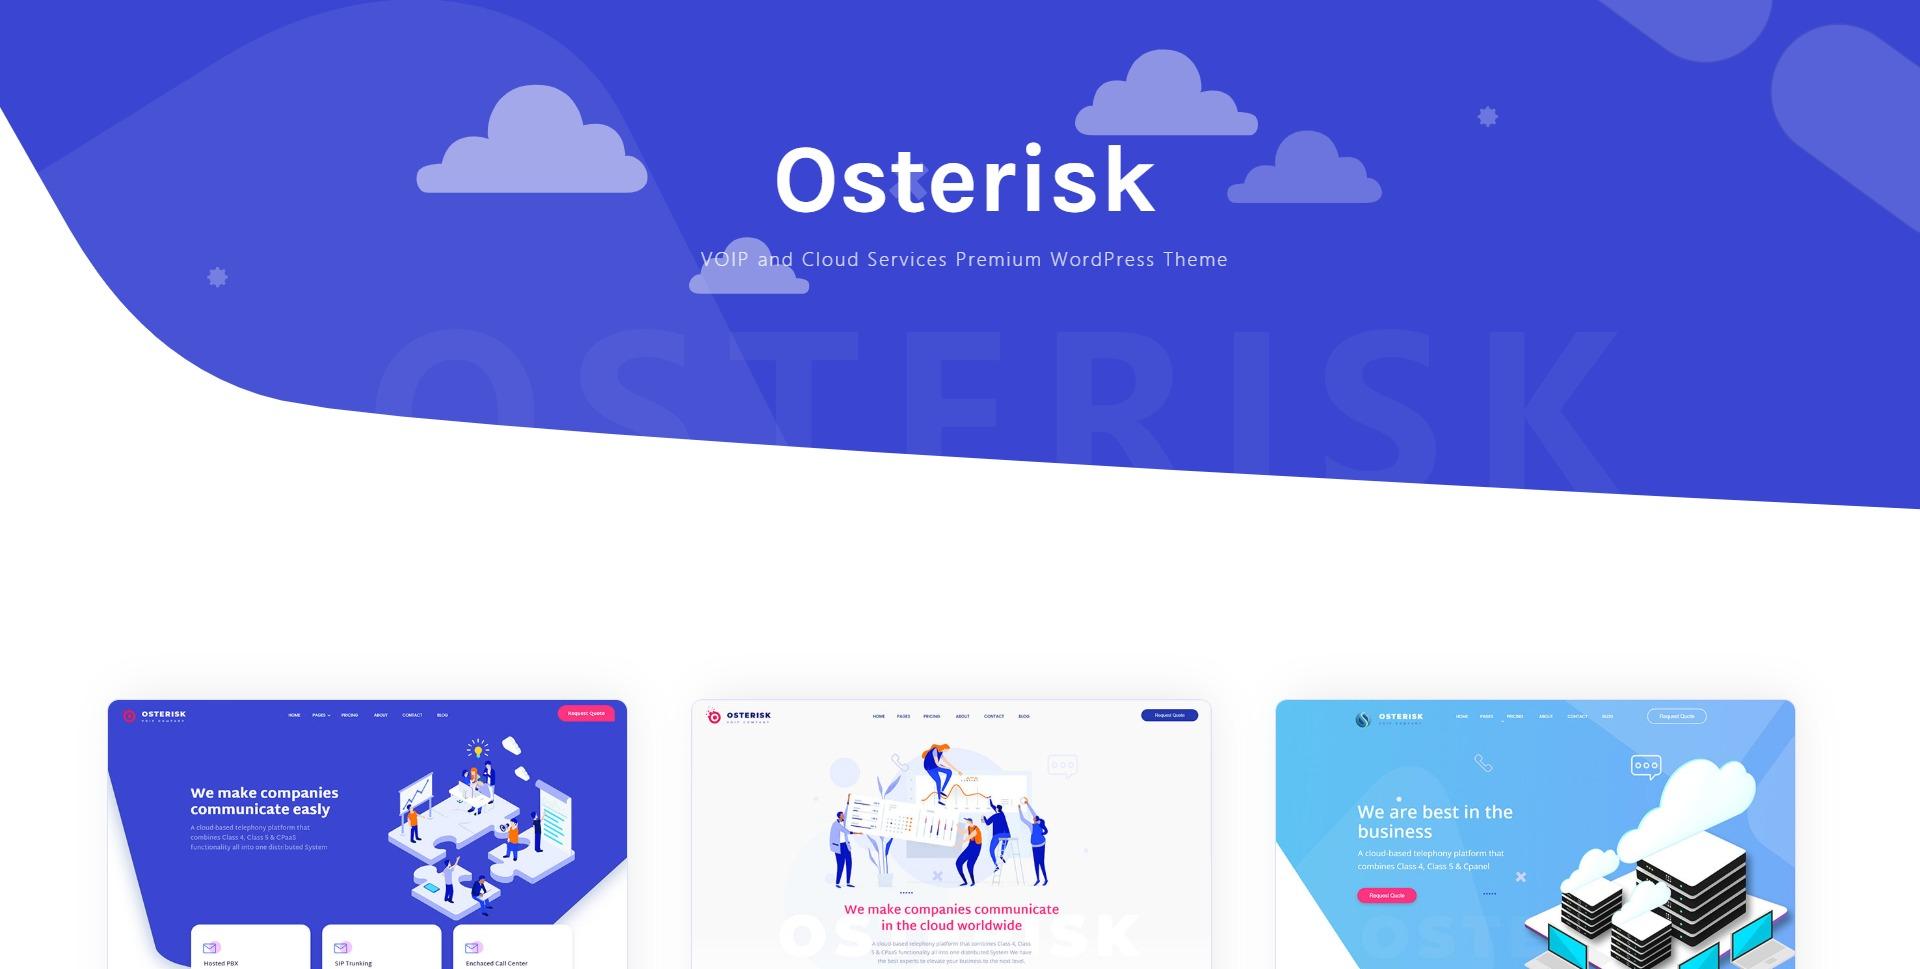 Osterisk-云储存域名注册企业WordPress主题